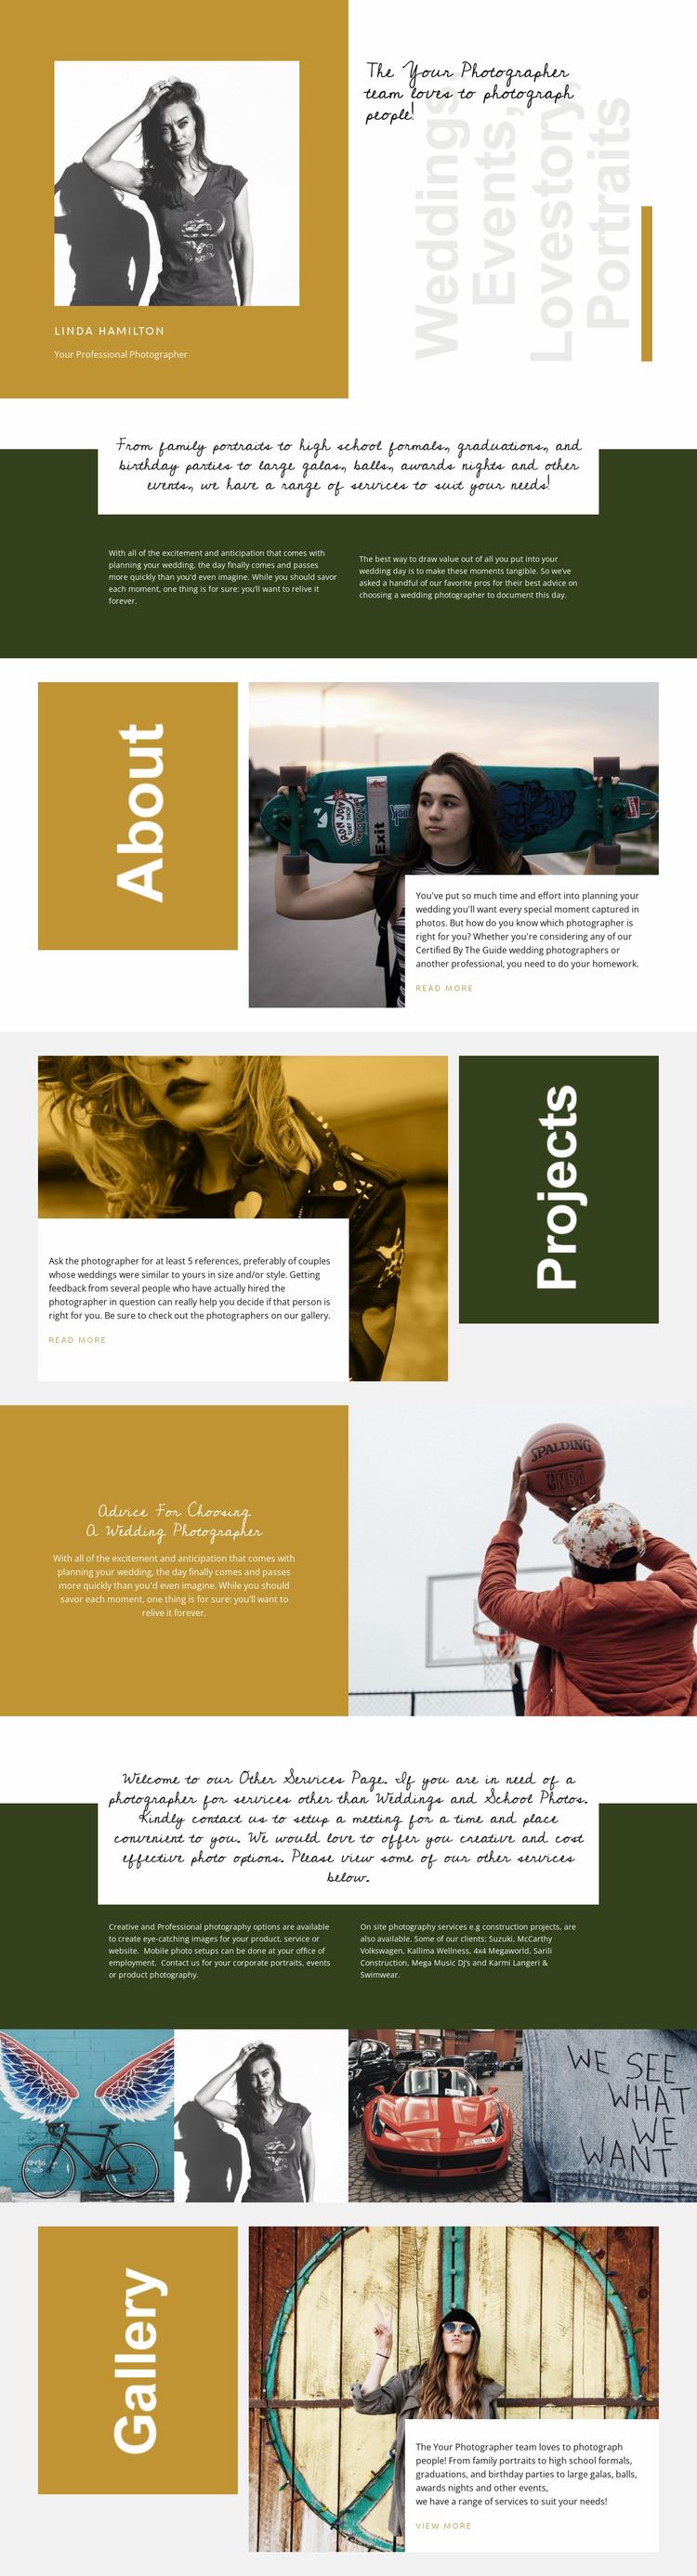 Fashion photography courses Website Mockup